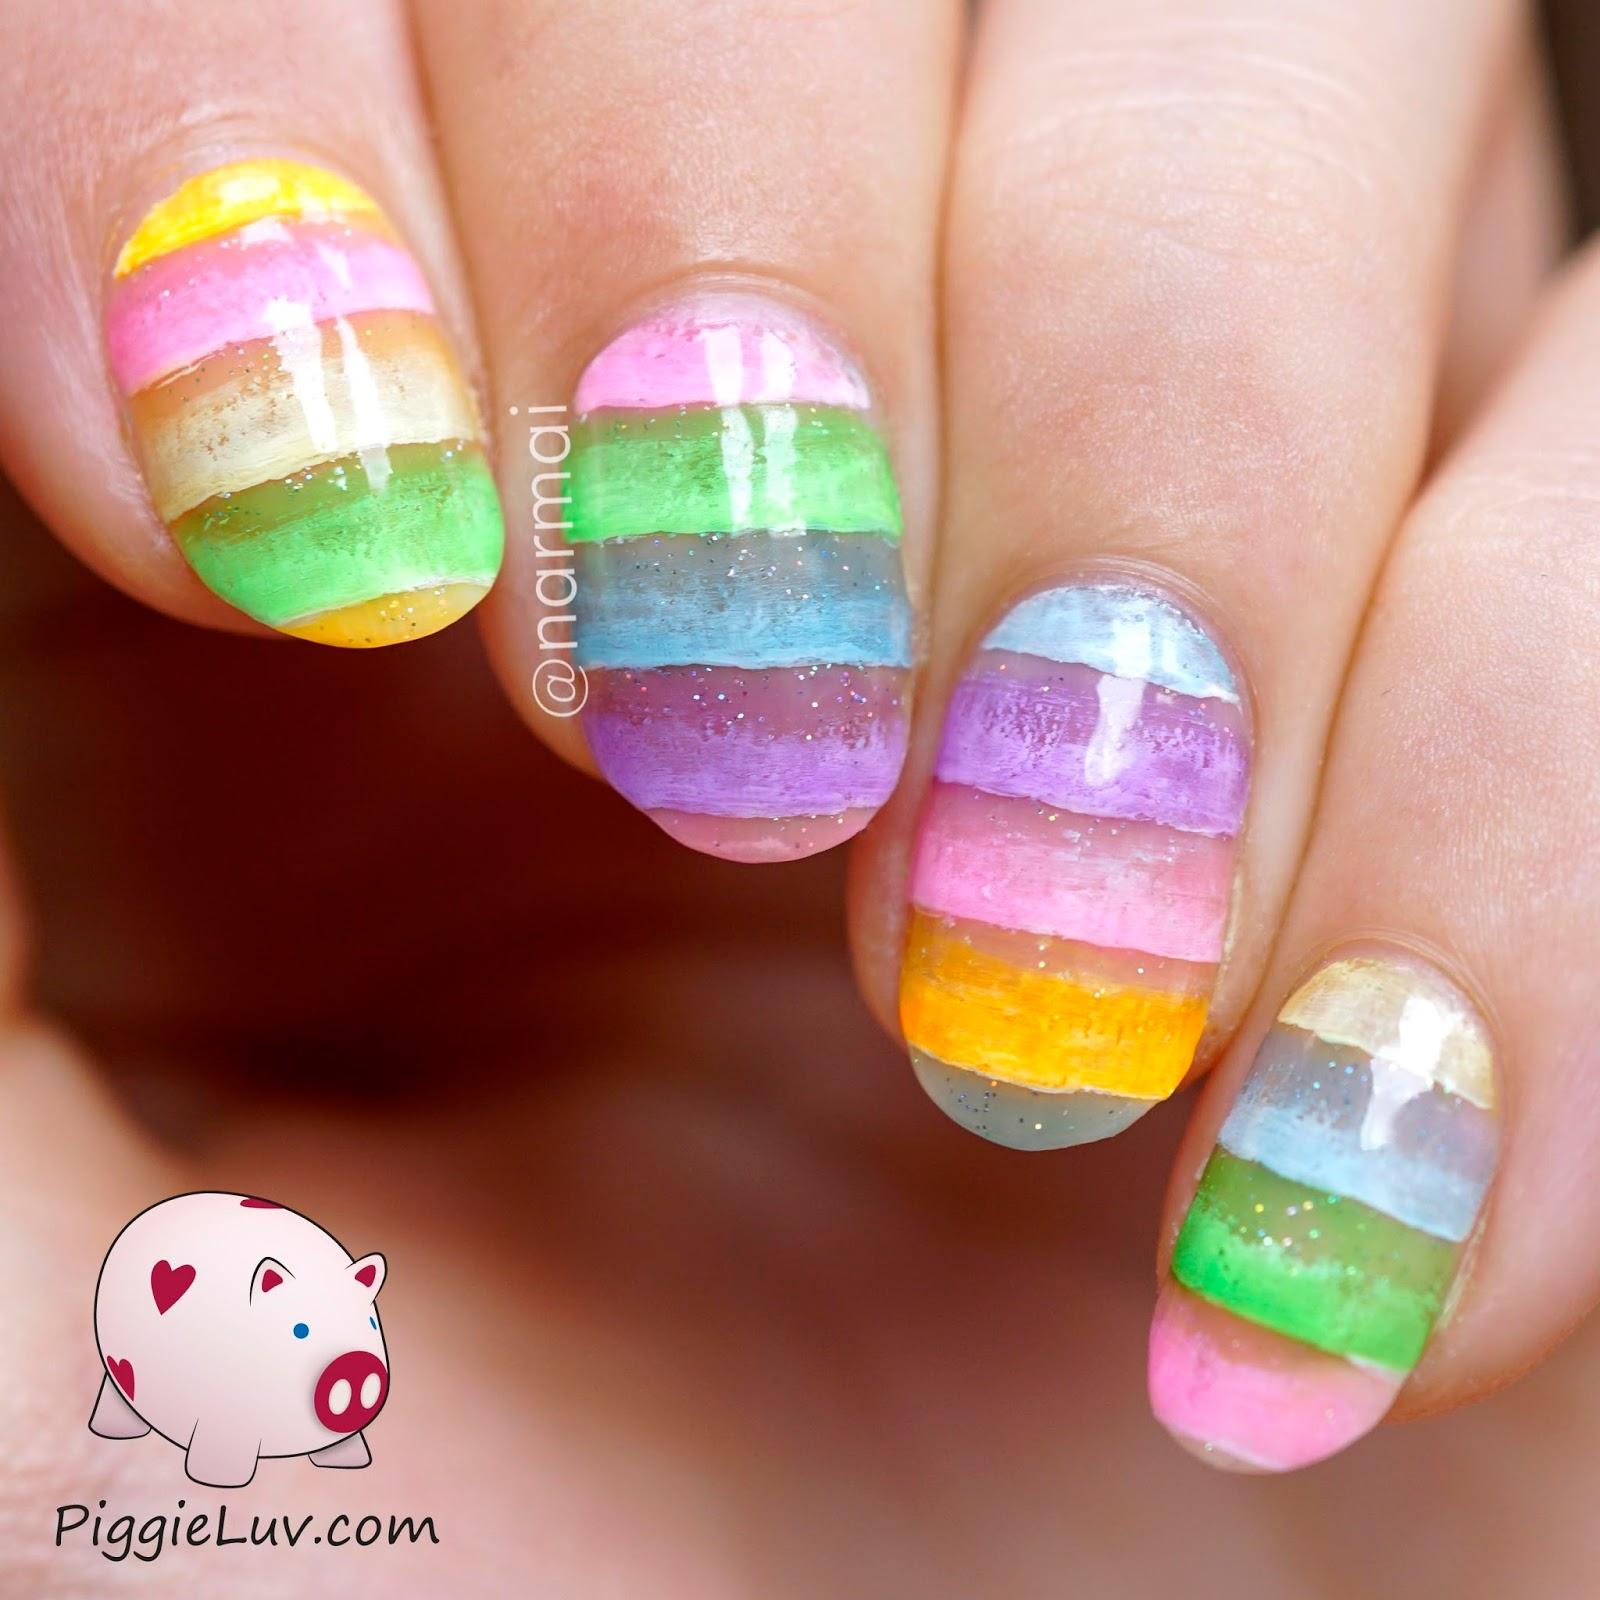 Piggieluv Jelly Dessert Nail Art With Opi Sheer Tints